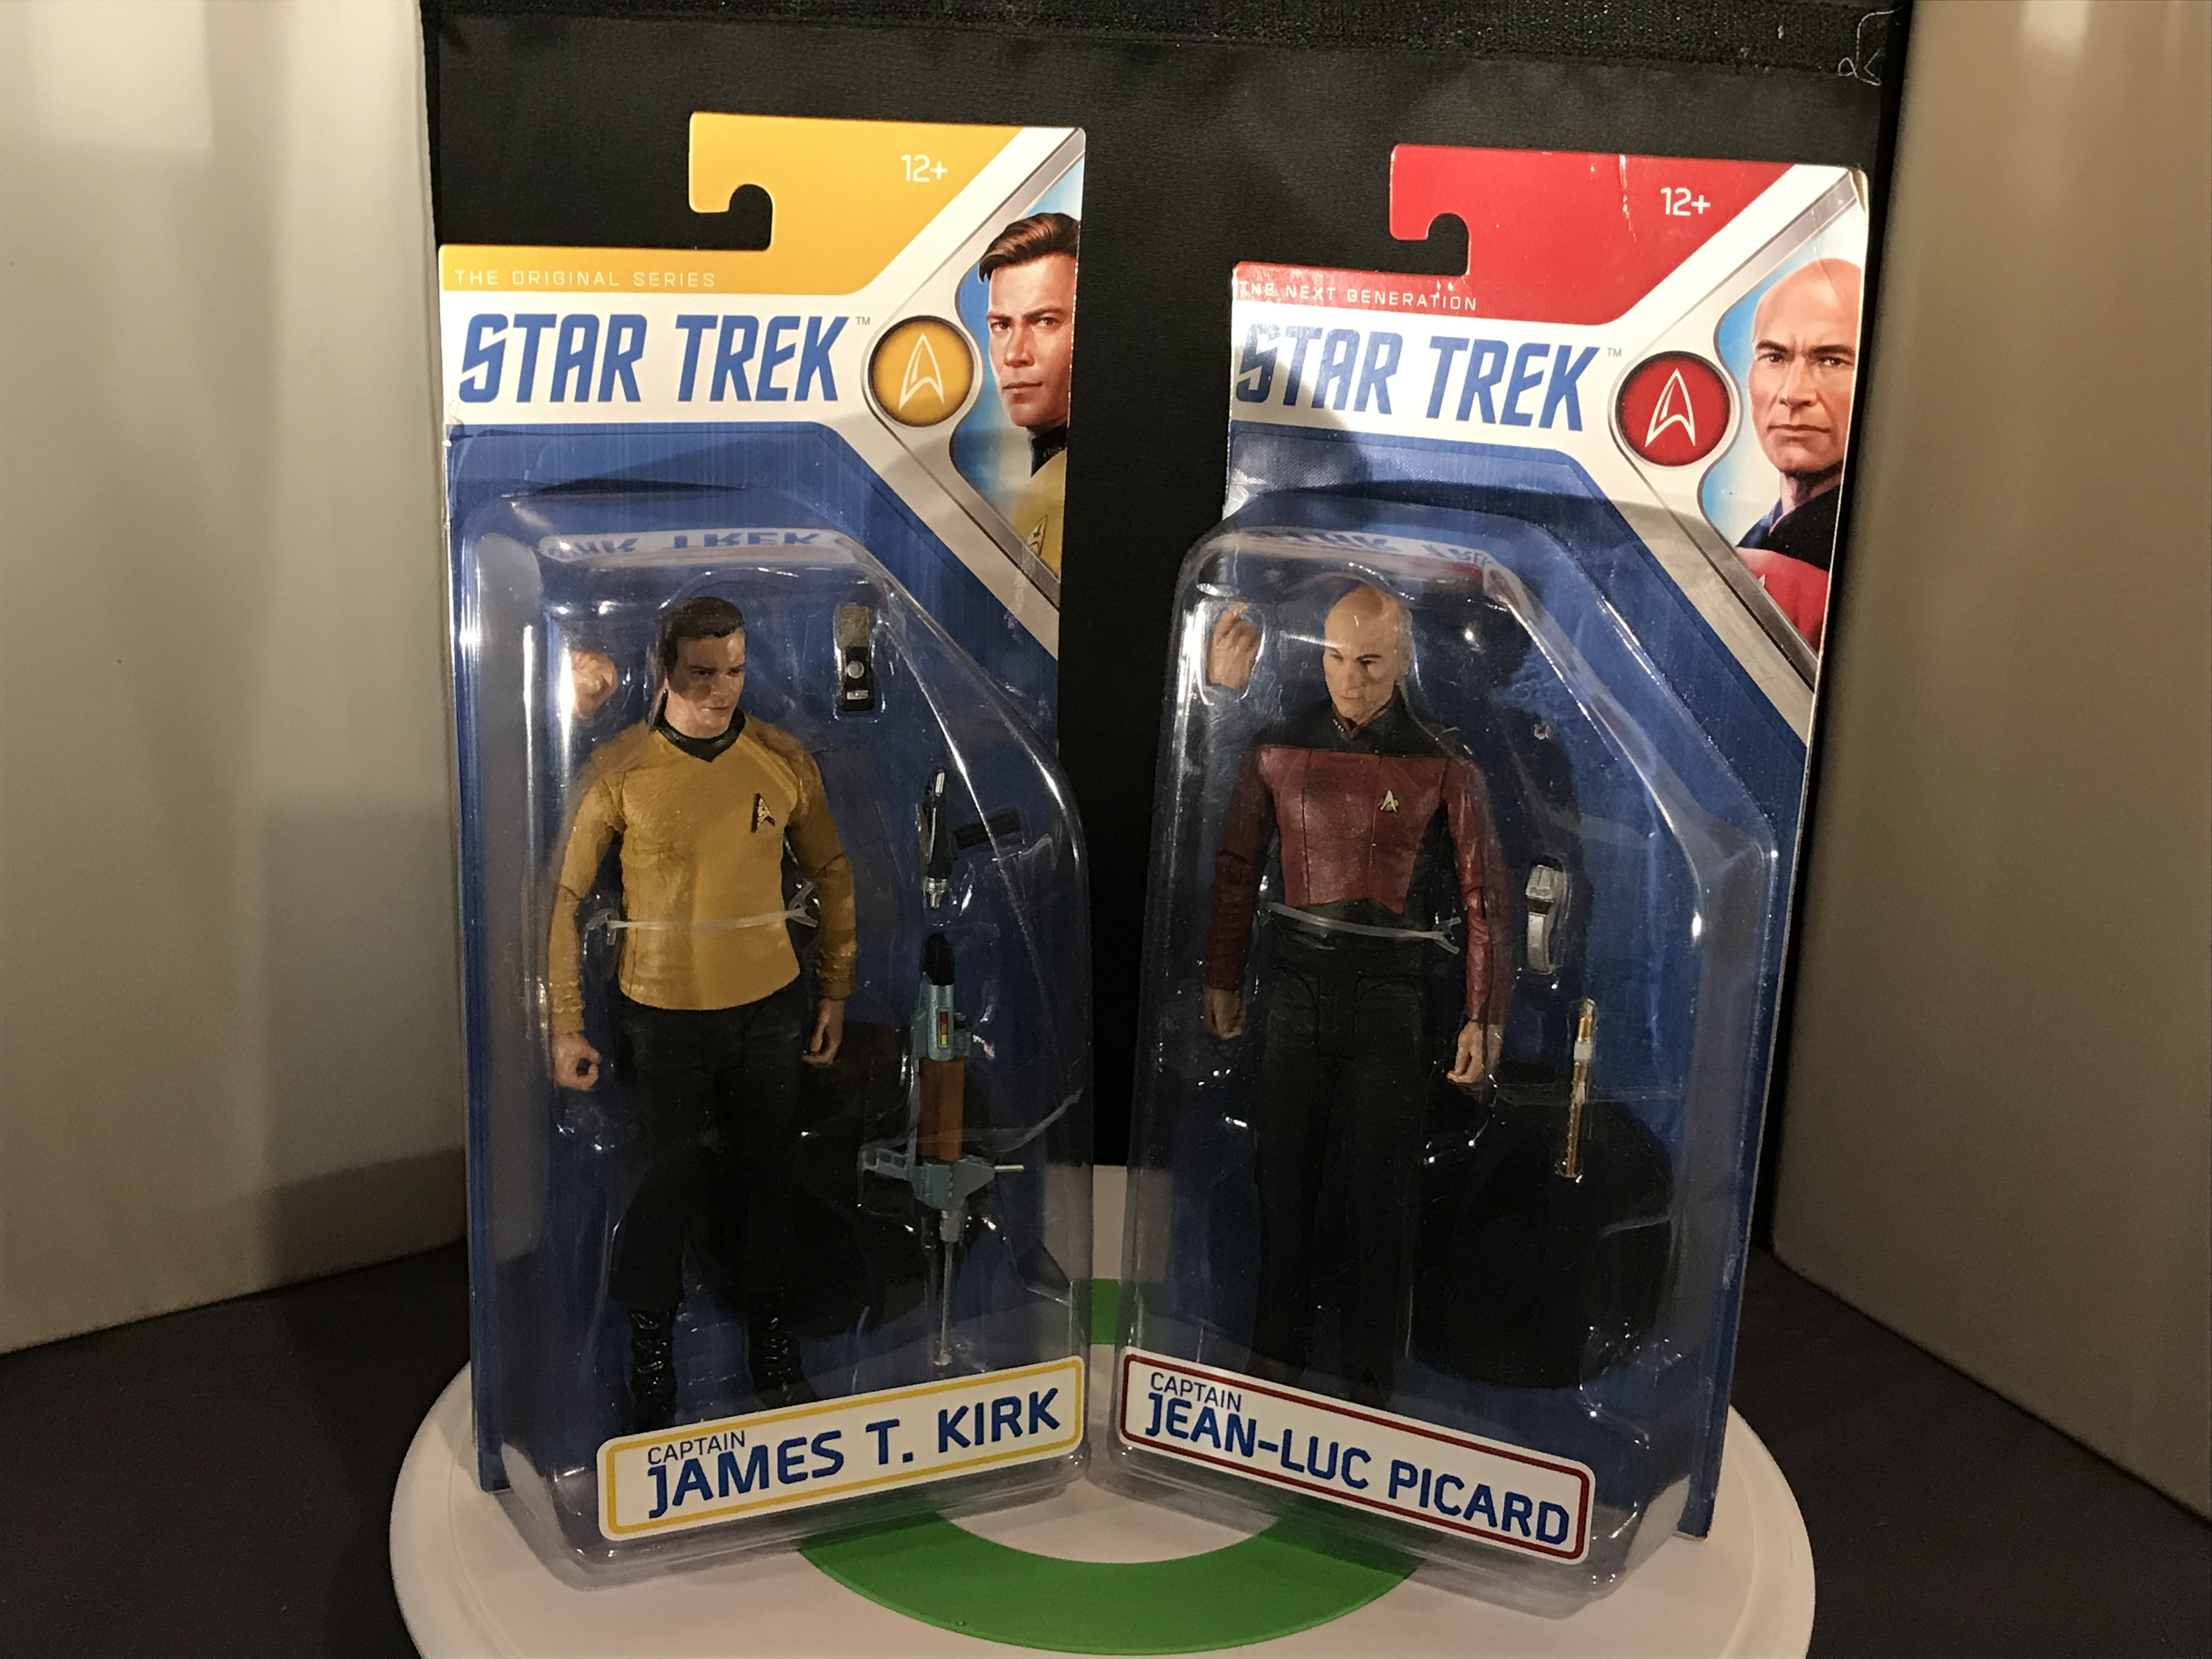 Hands On!: Star Trek Series One Figures by McFarlane Toys